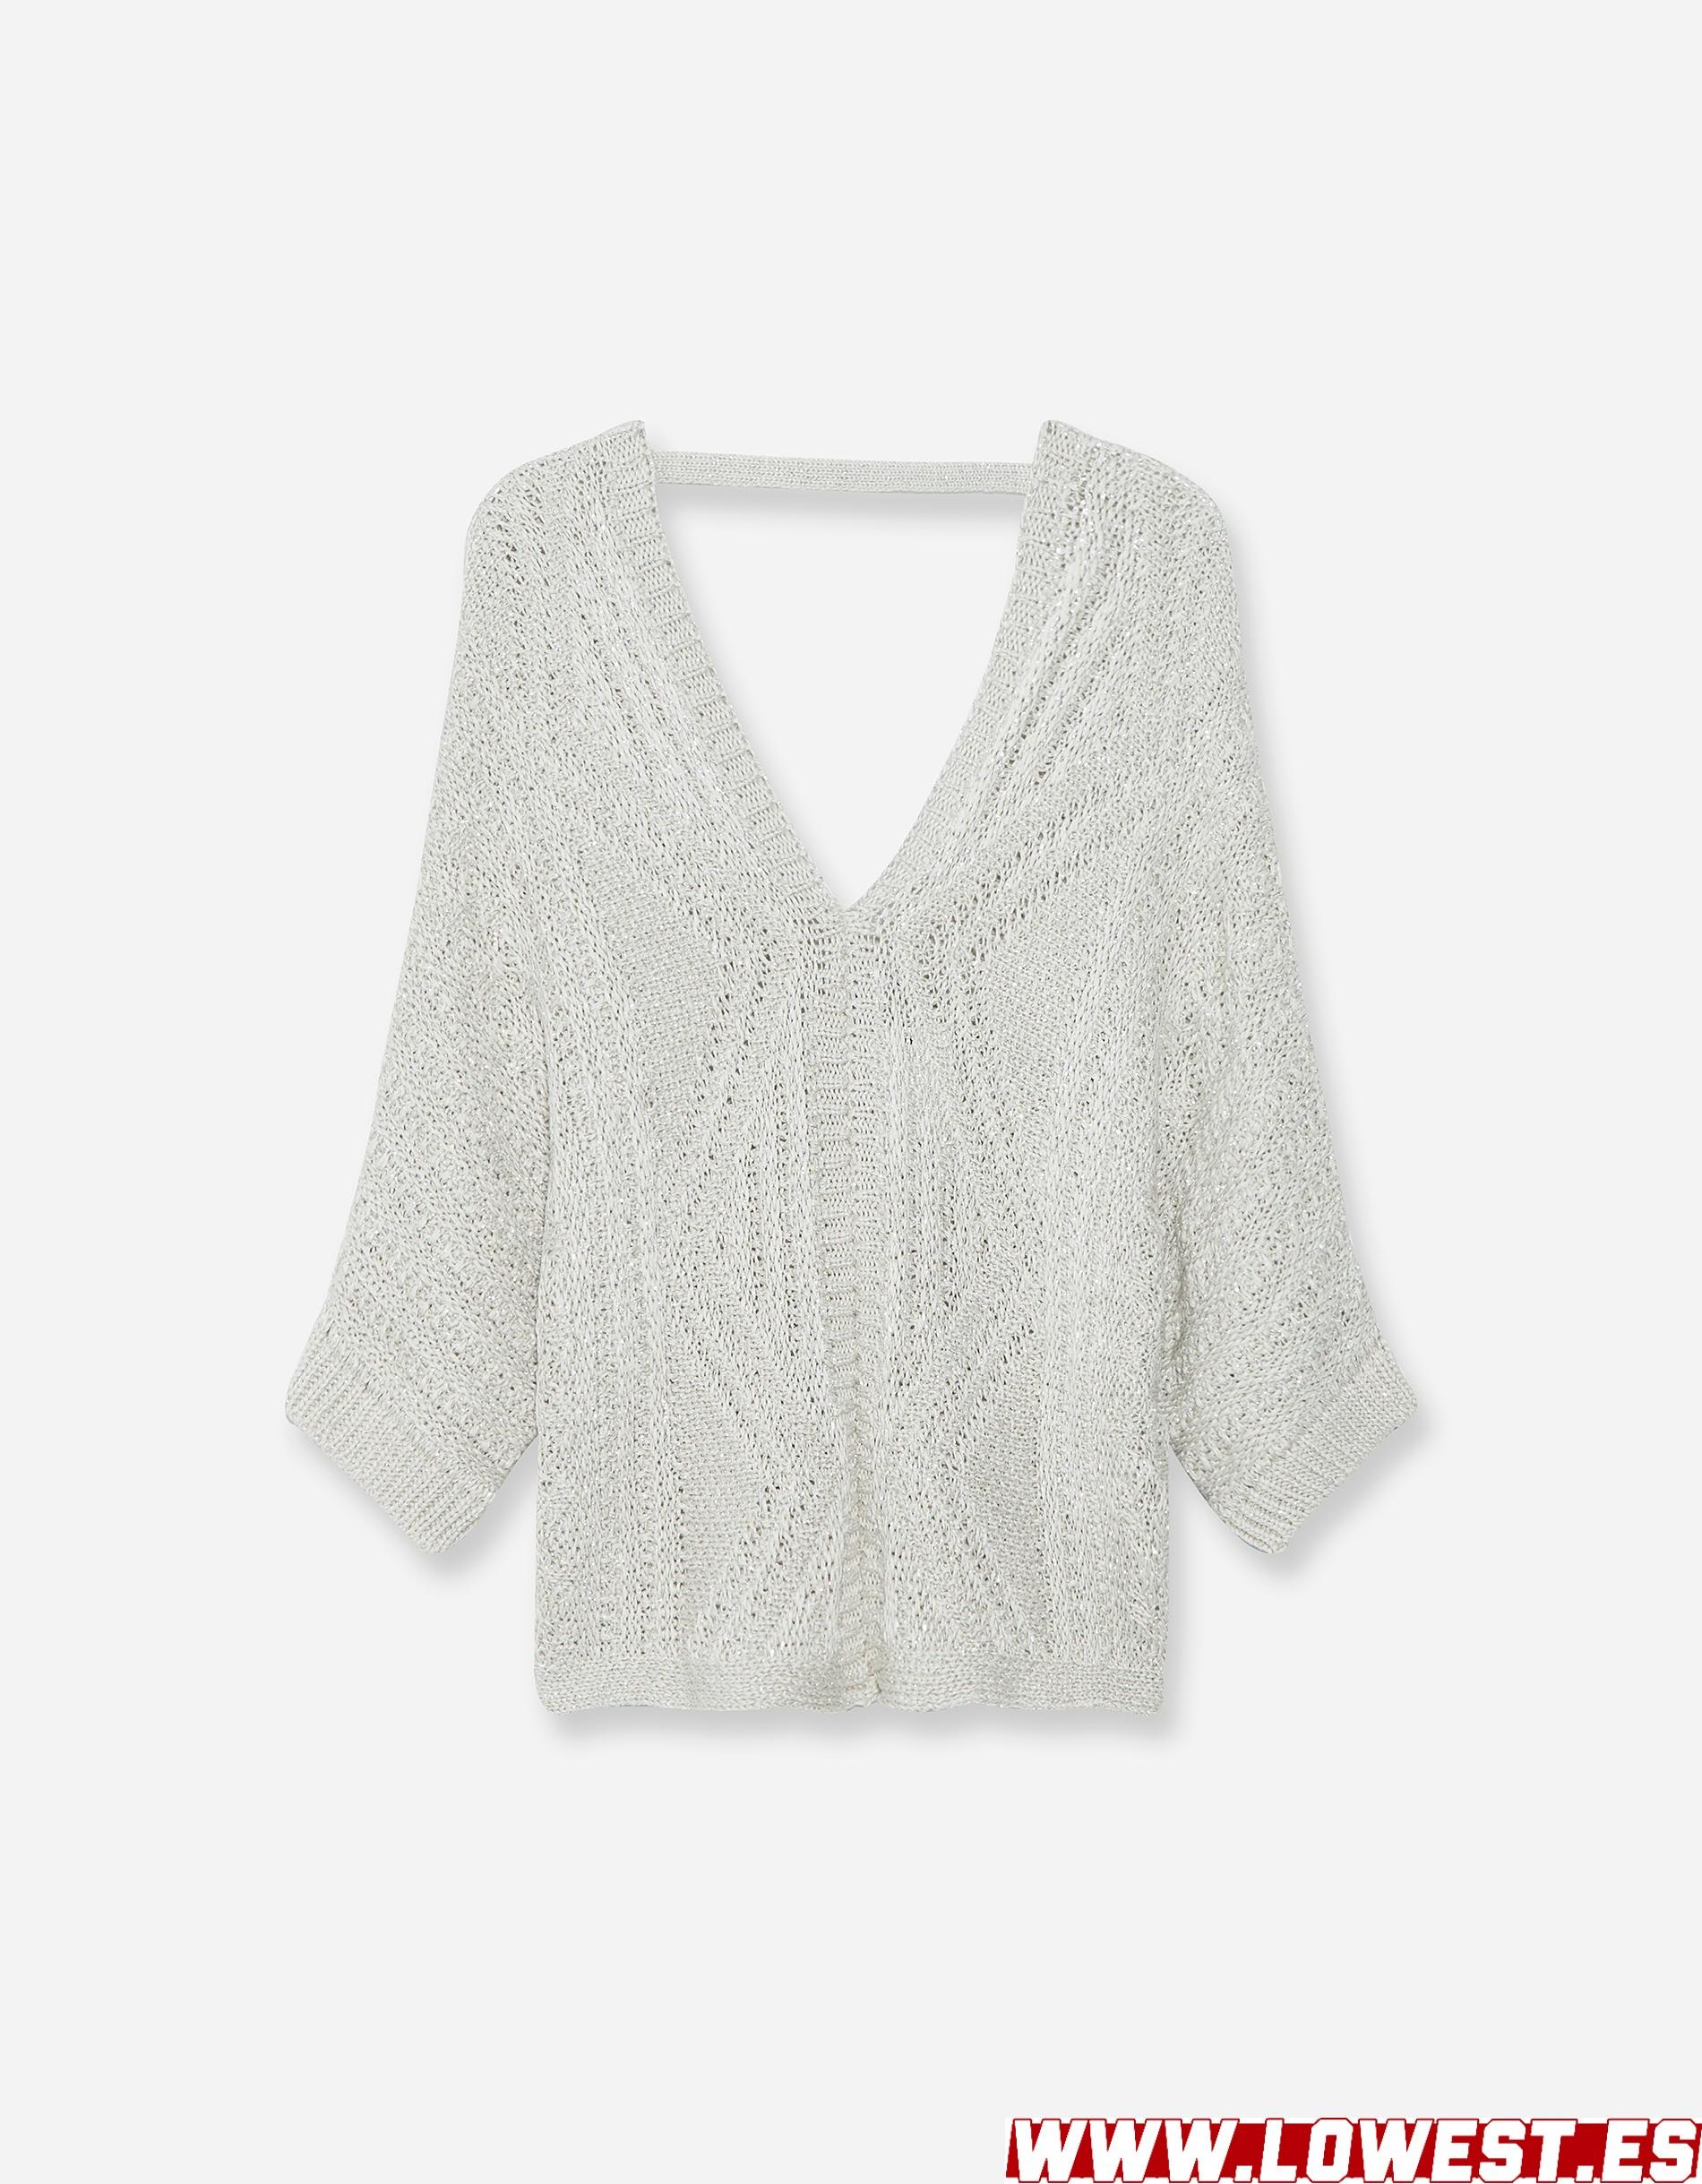 rebajas mujer Lowest vestidos blancos 2019 2020